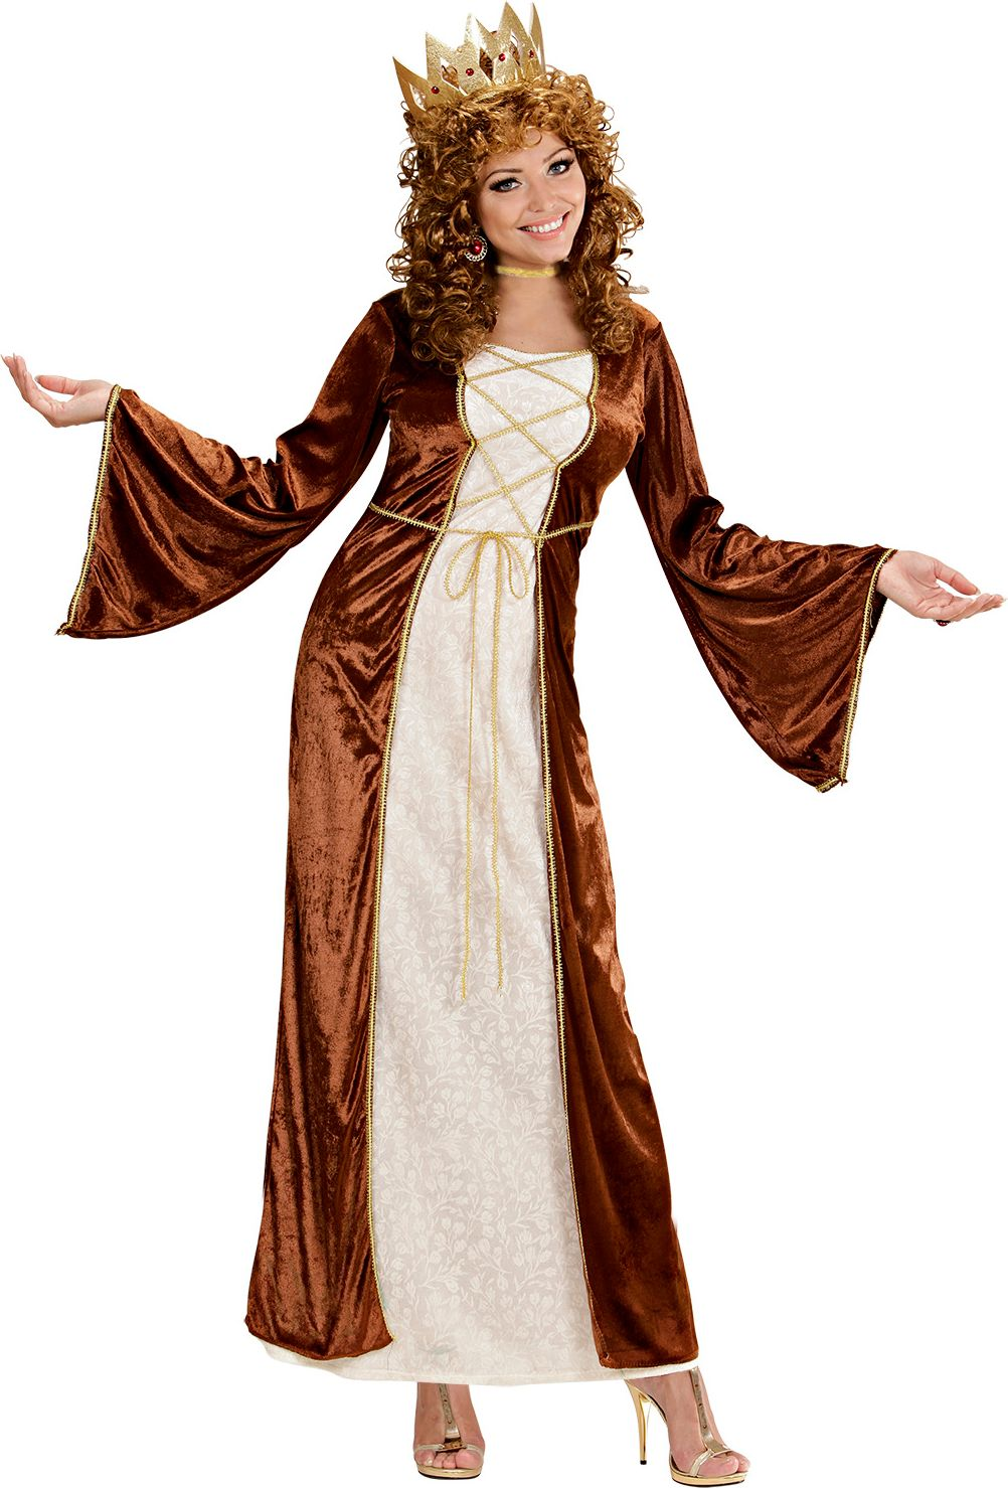 Middeleeuwse prinses kostuum